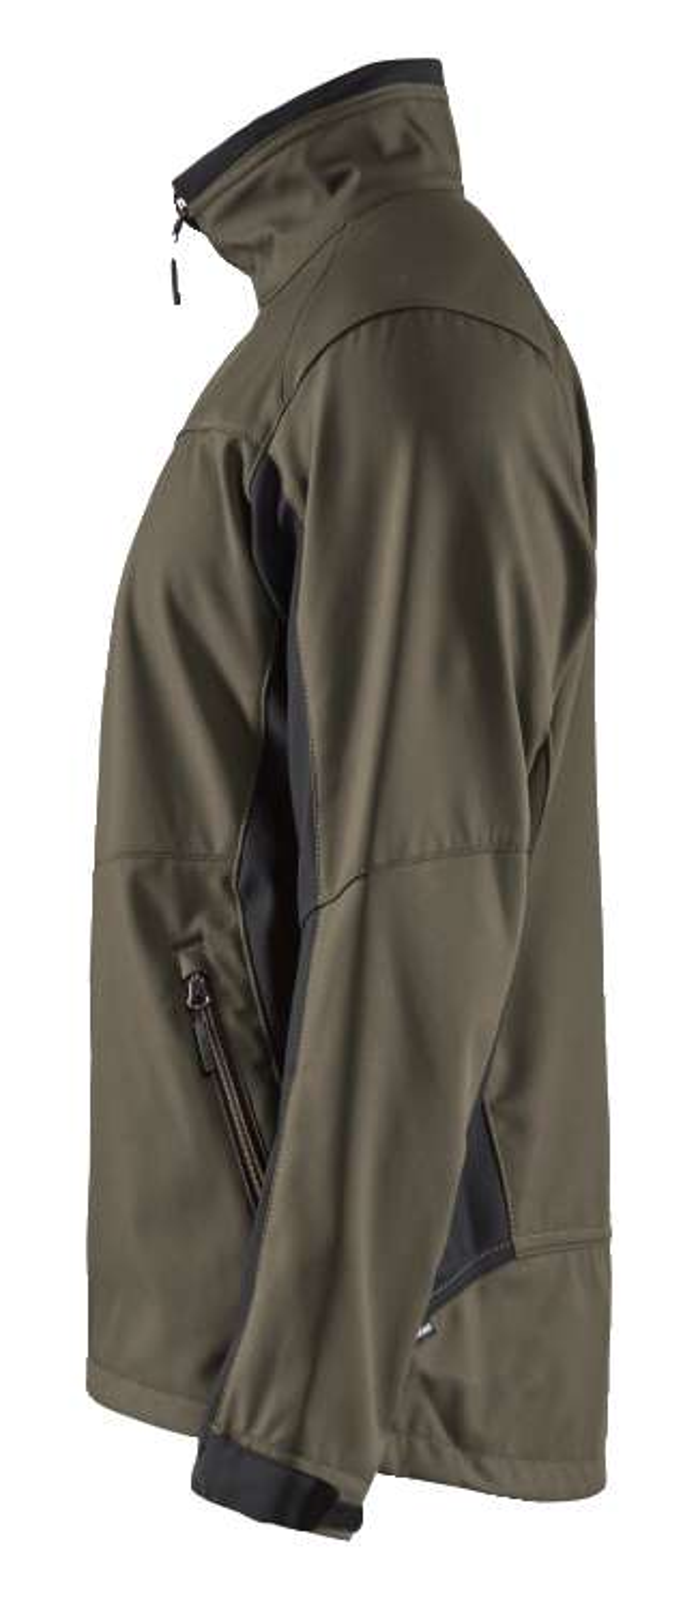 Blaklader Softshell jacks 49502516 groen-zwart(4599)